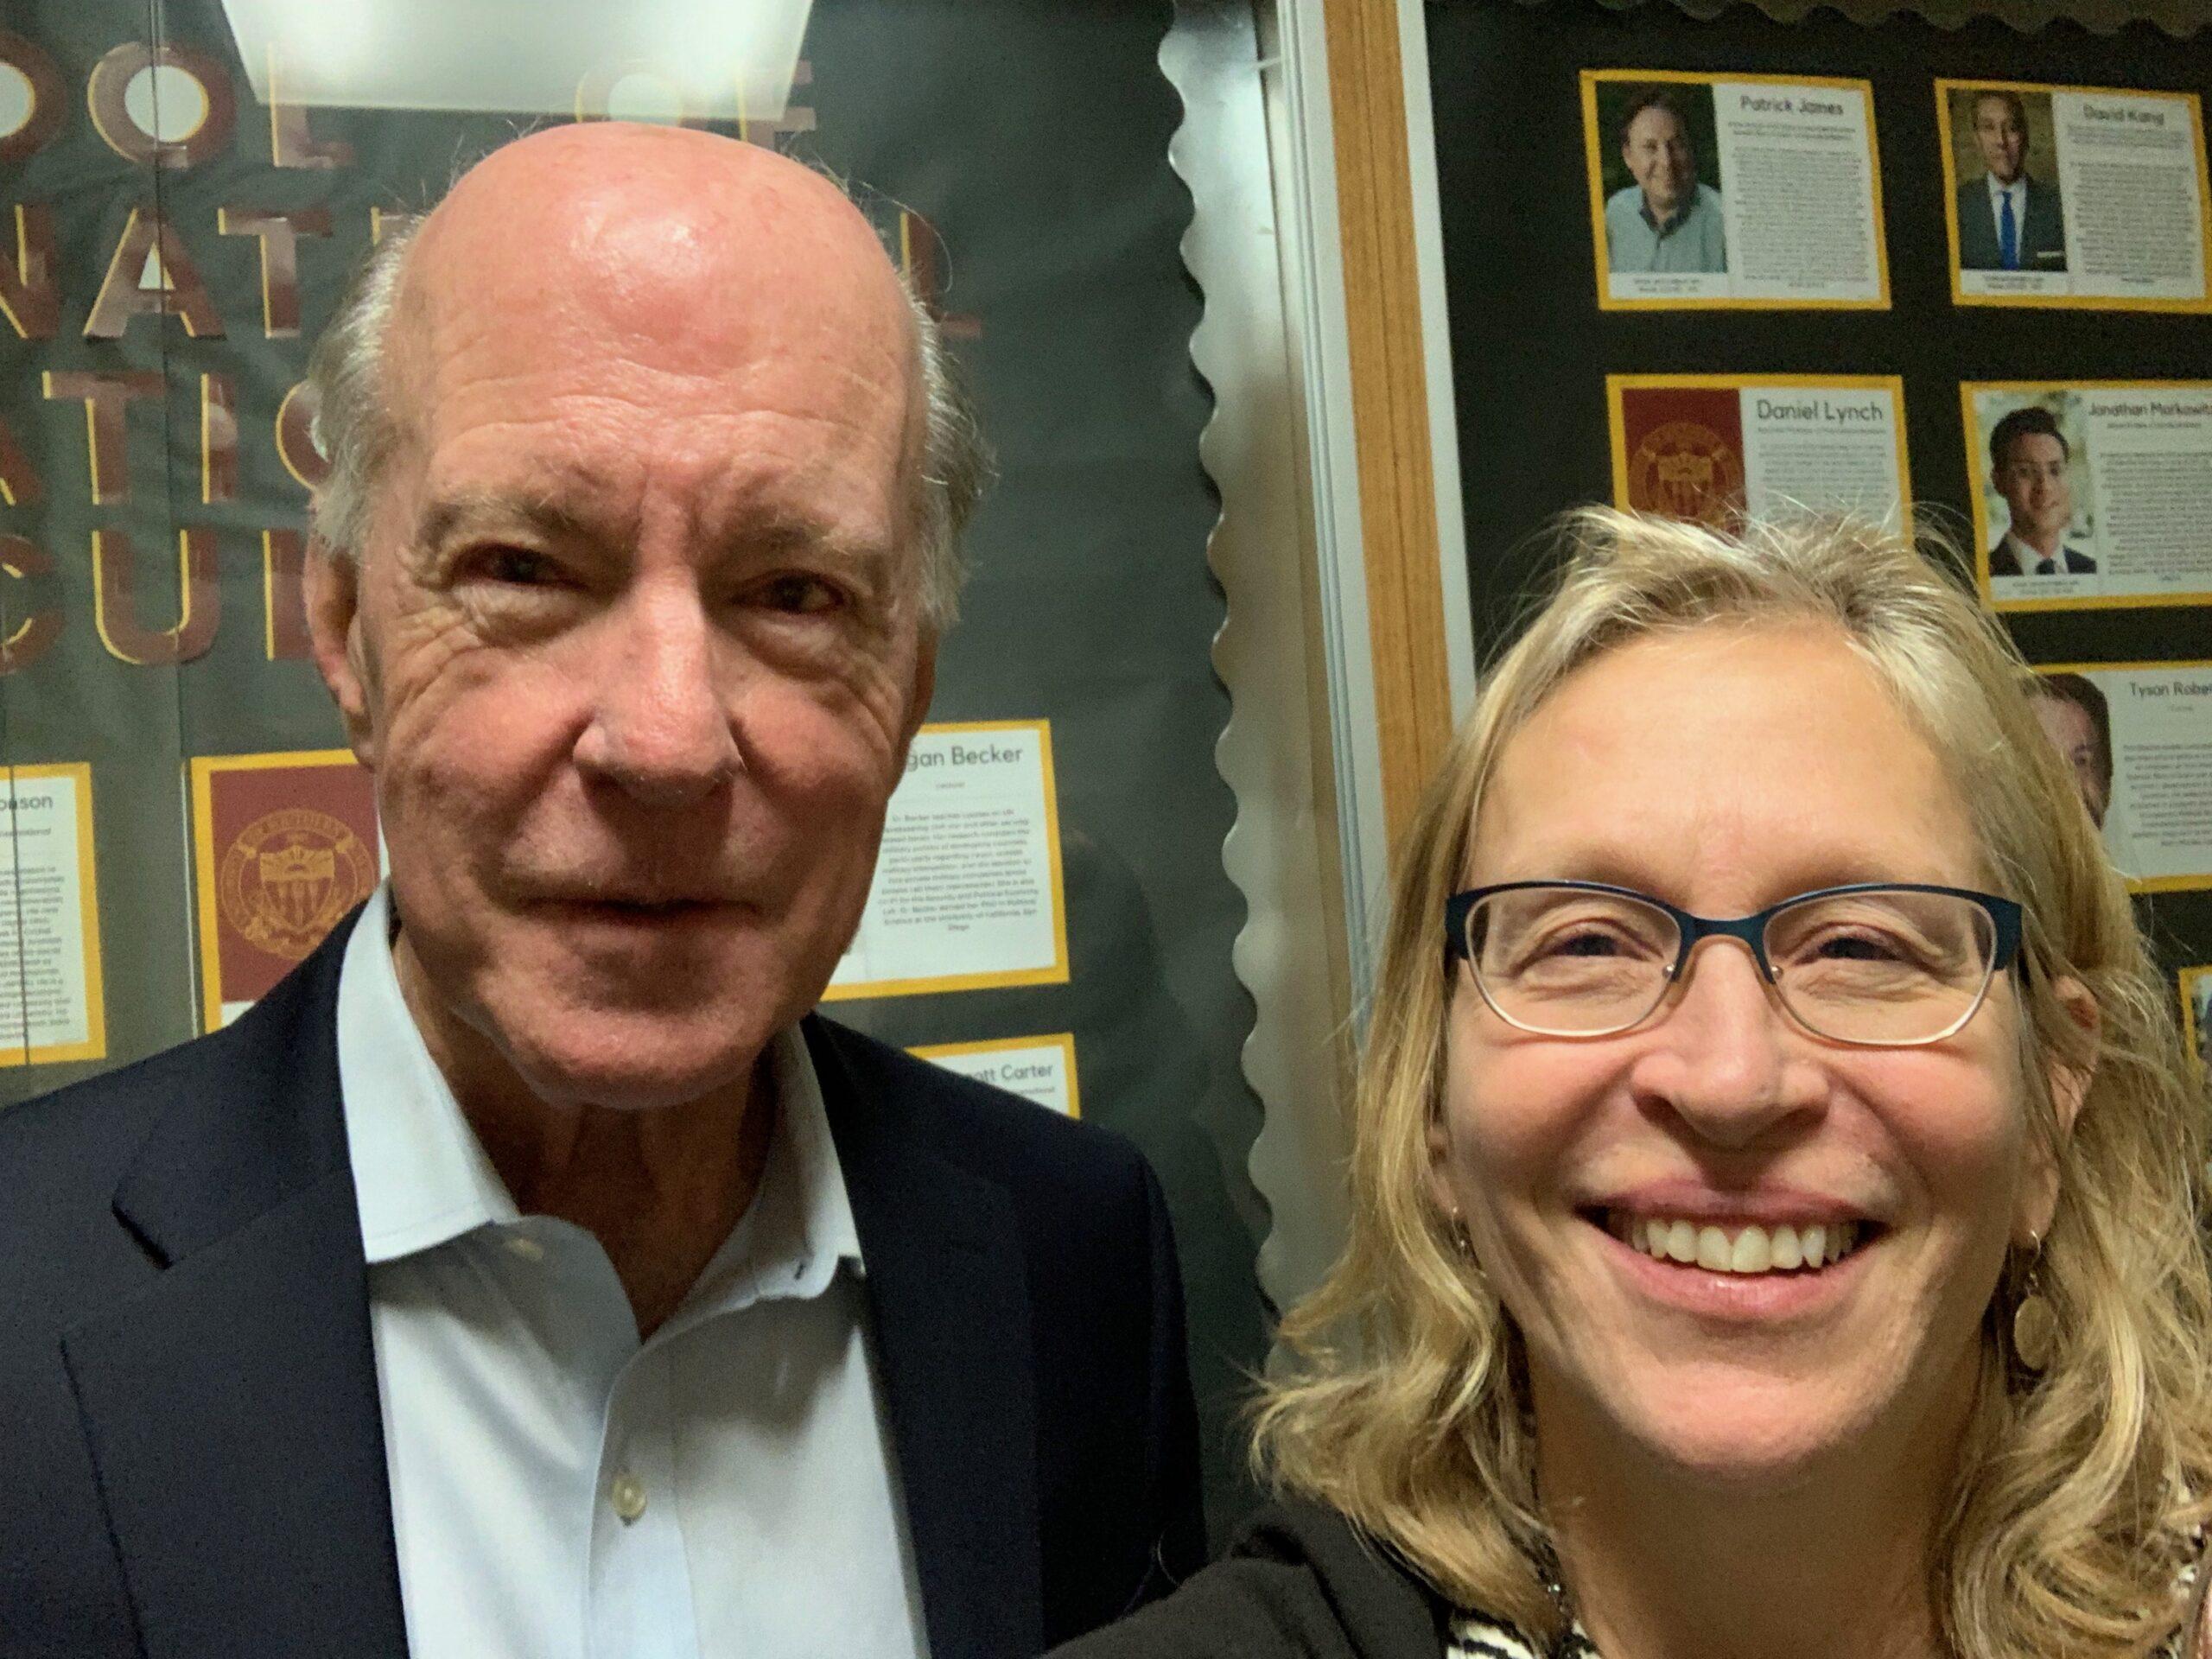 Molly Jahn and Greg Treverton